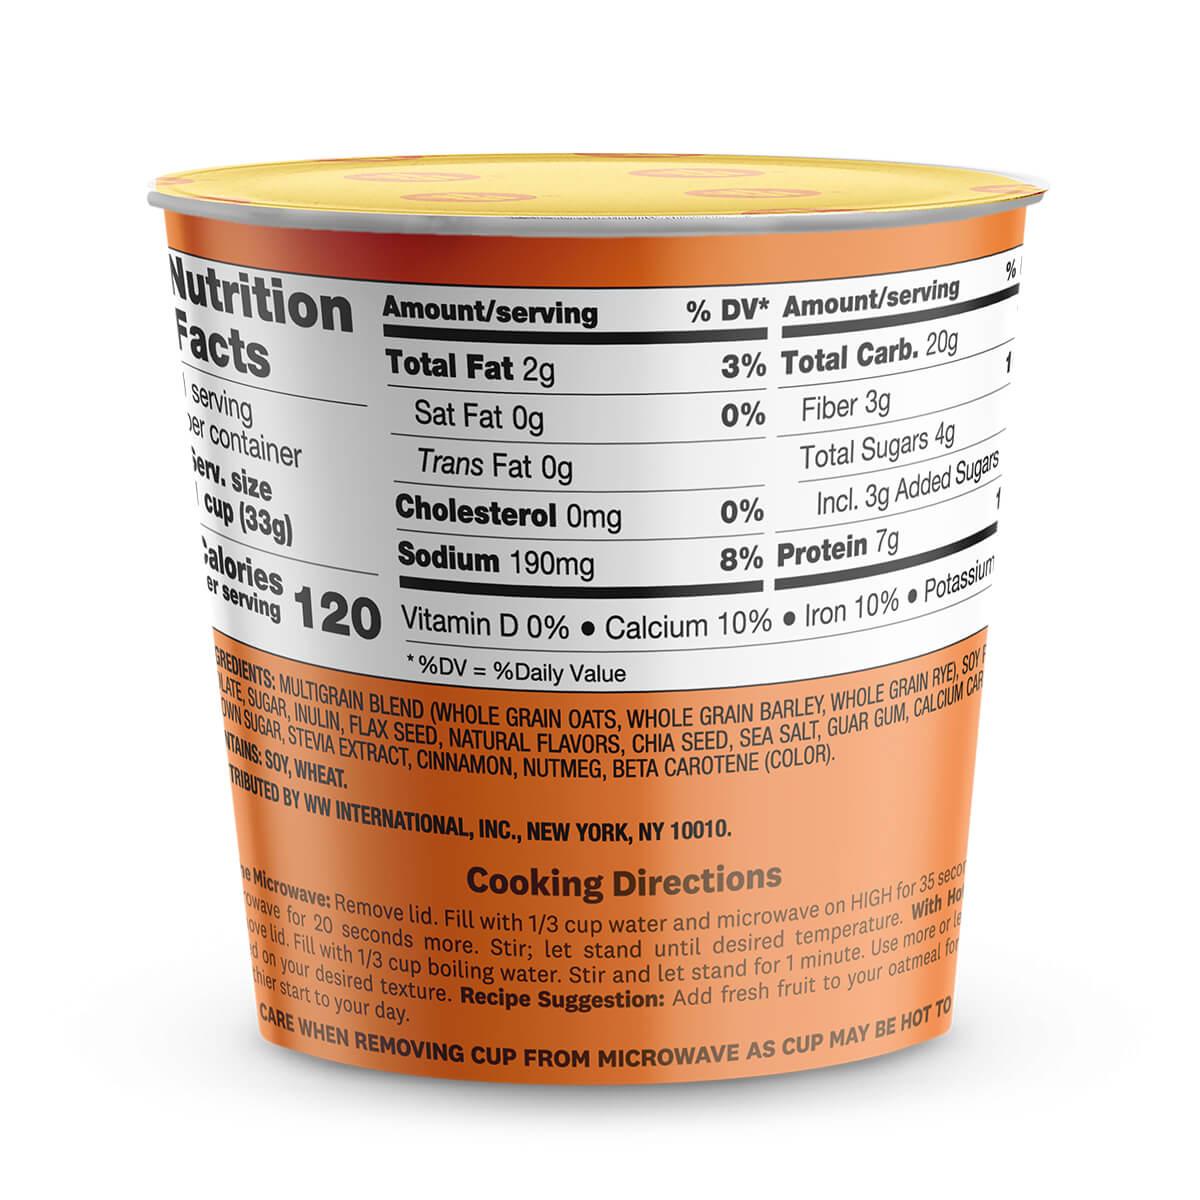 Pumpkin Spice Oatmeal - cup back